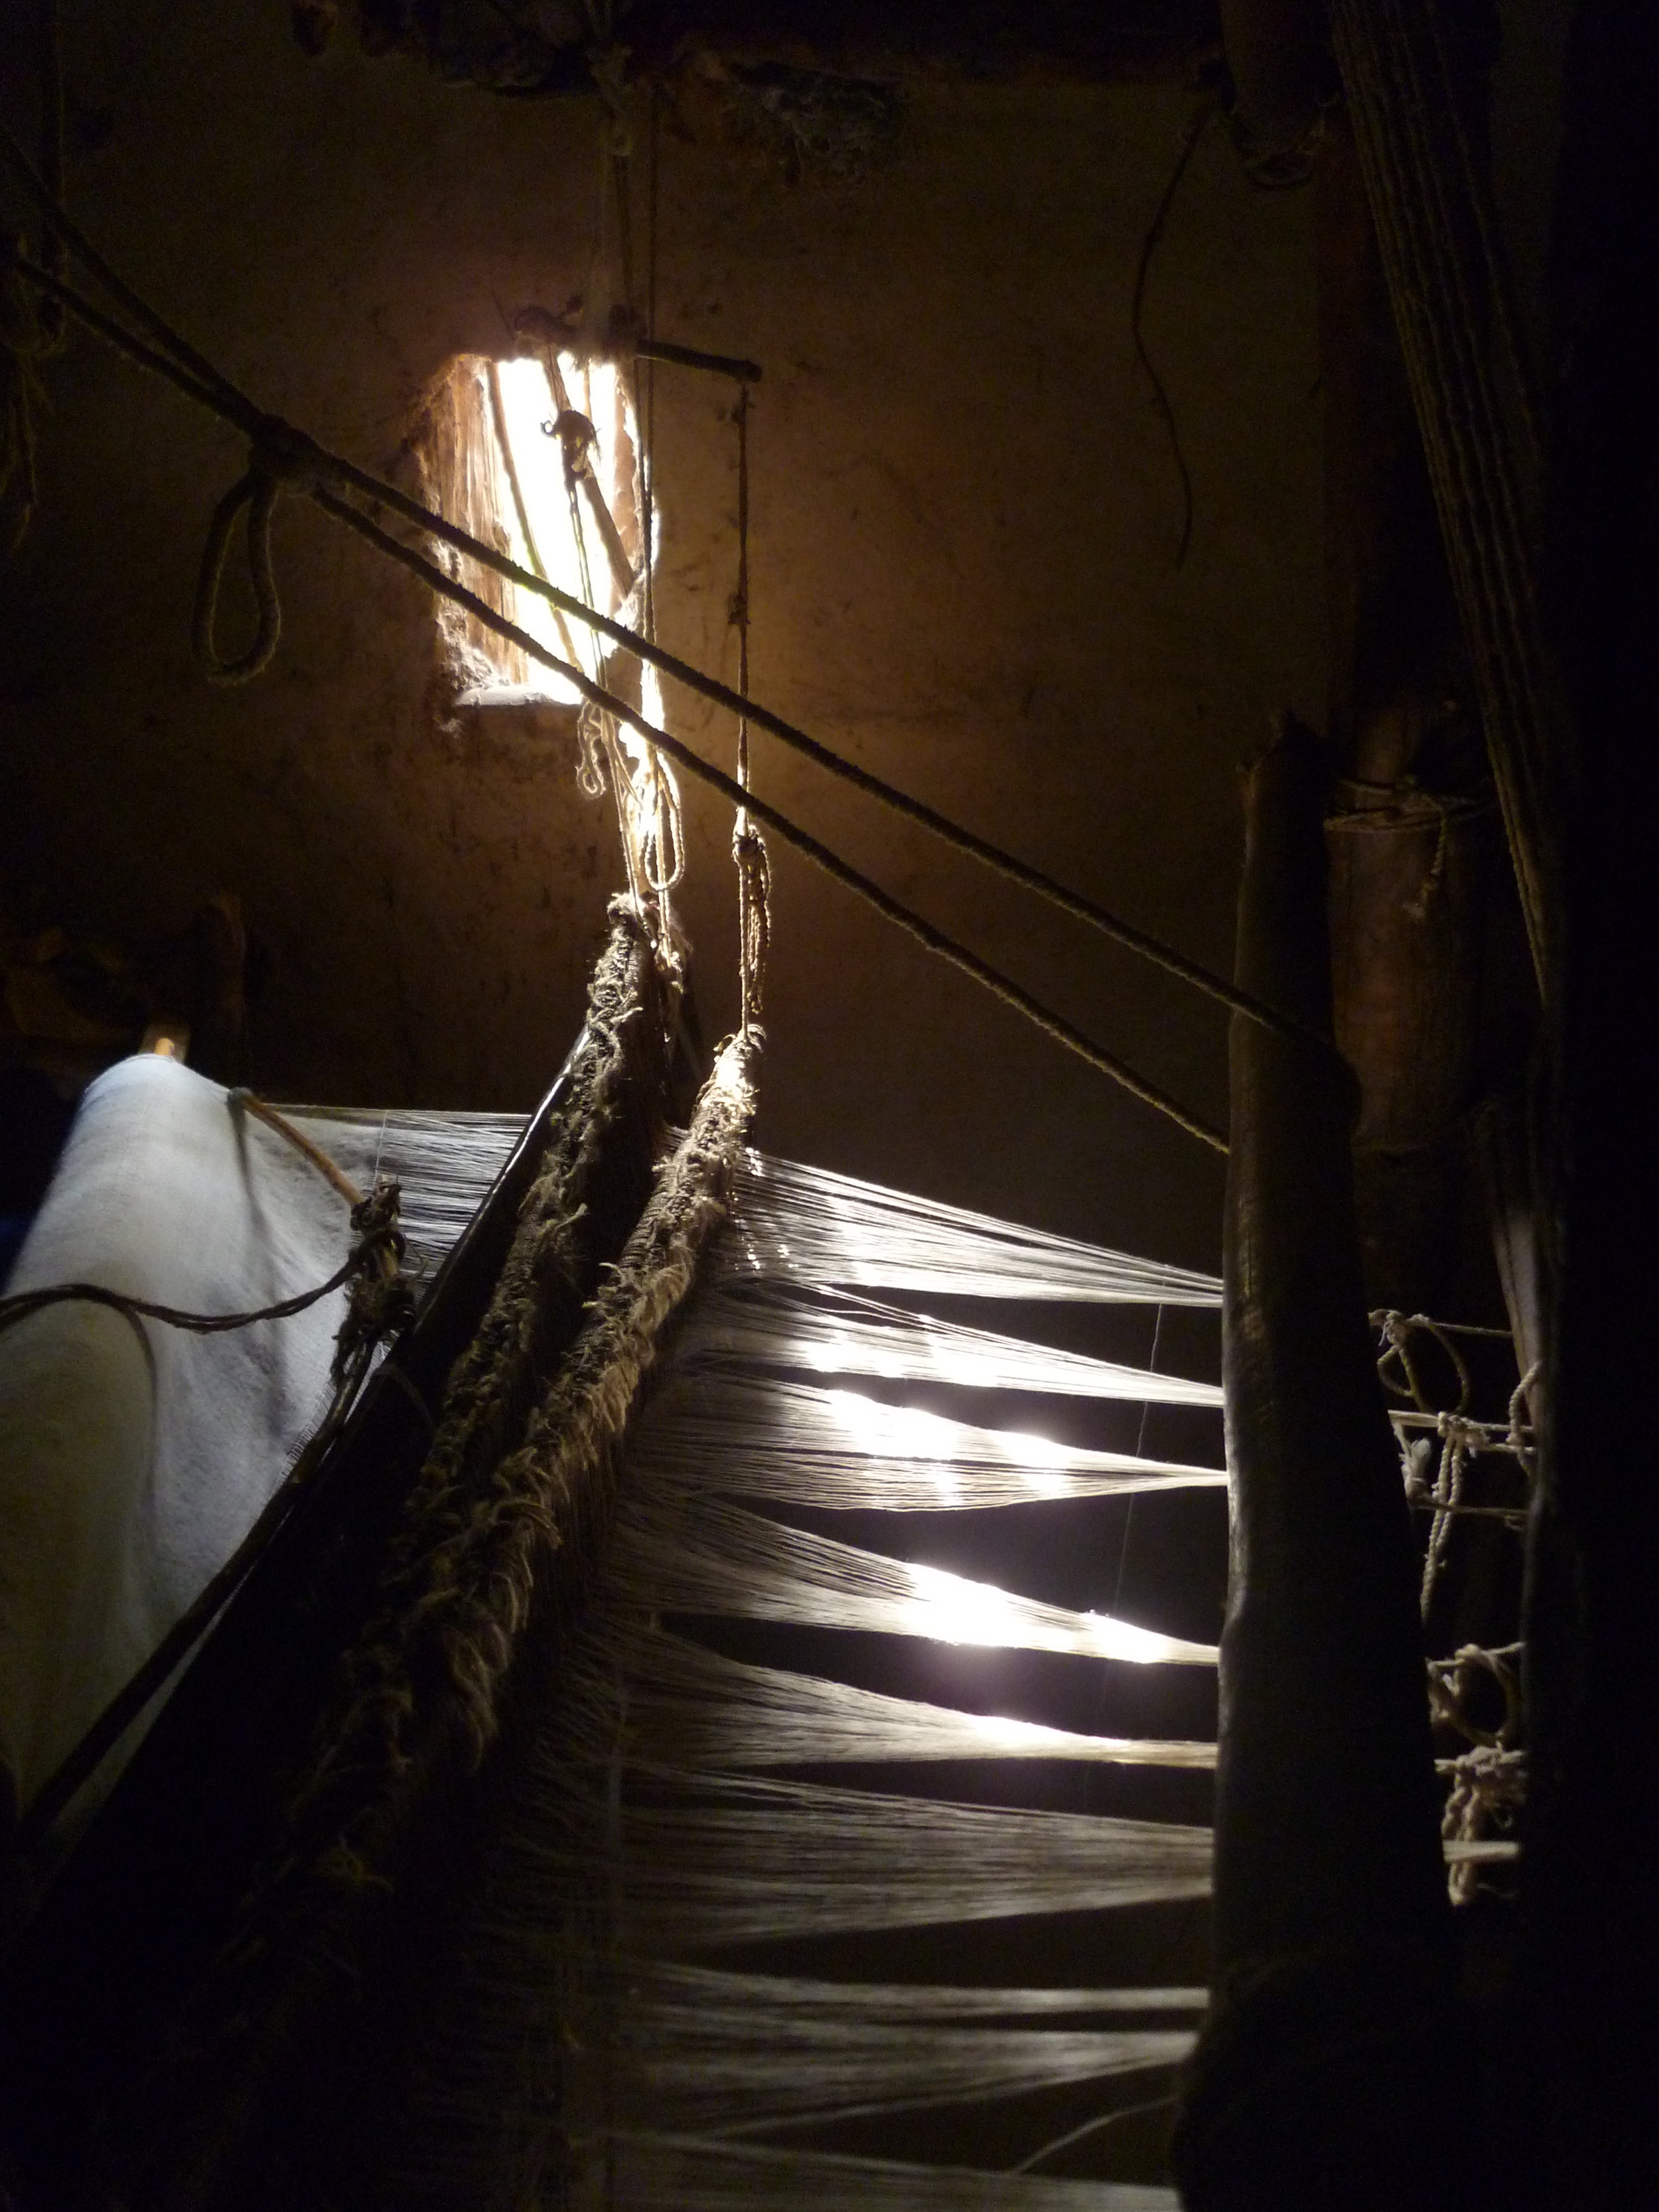 Sunlight pouring through the workshop windows illuminating the intricate Awra Amba weaving...